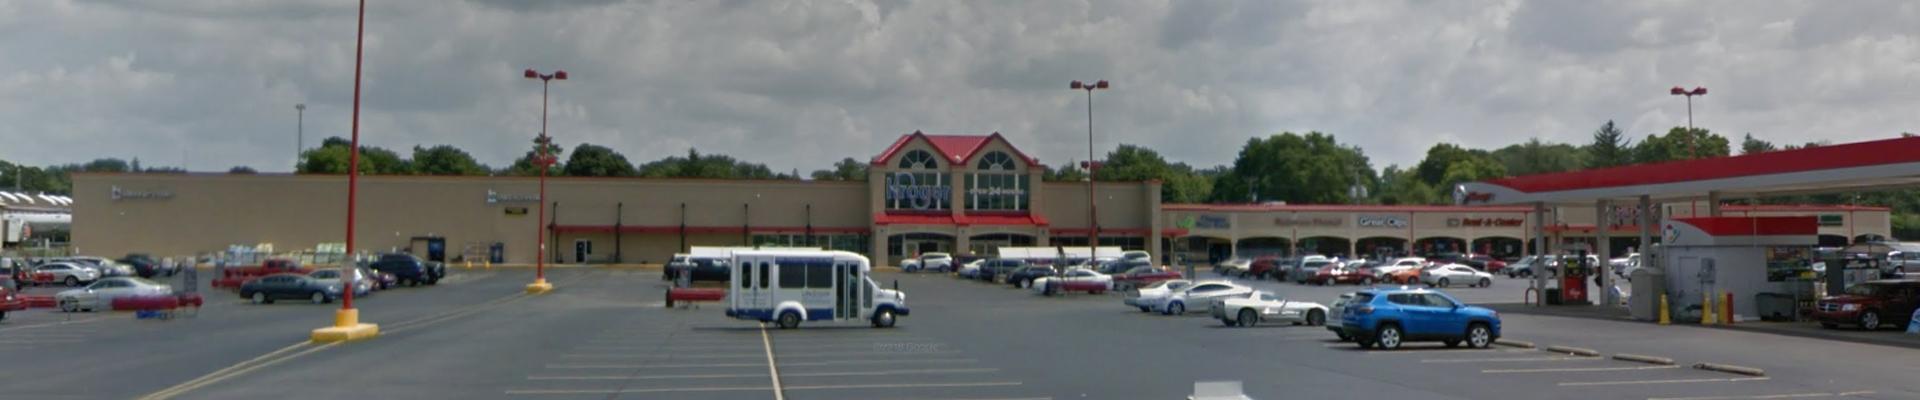 Trojan Plaza Shopping Center